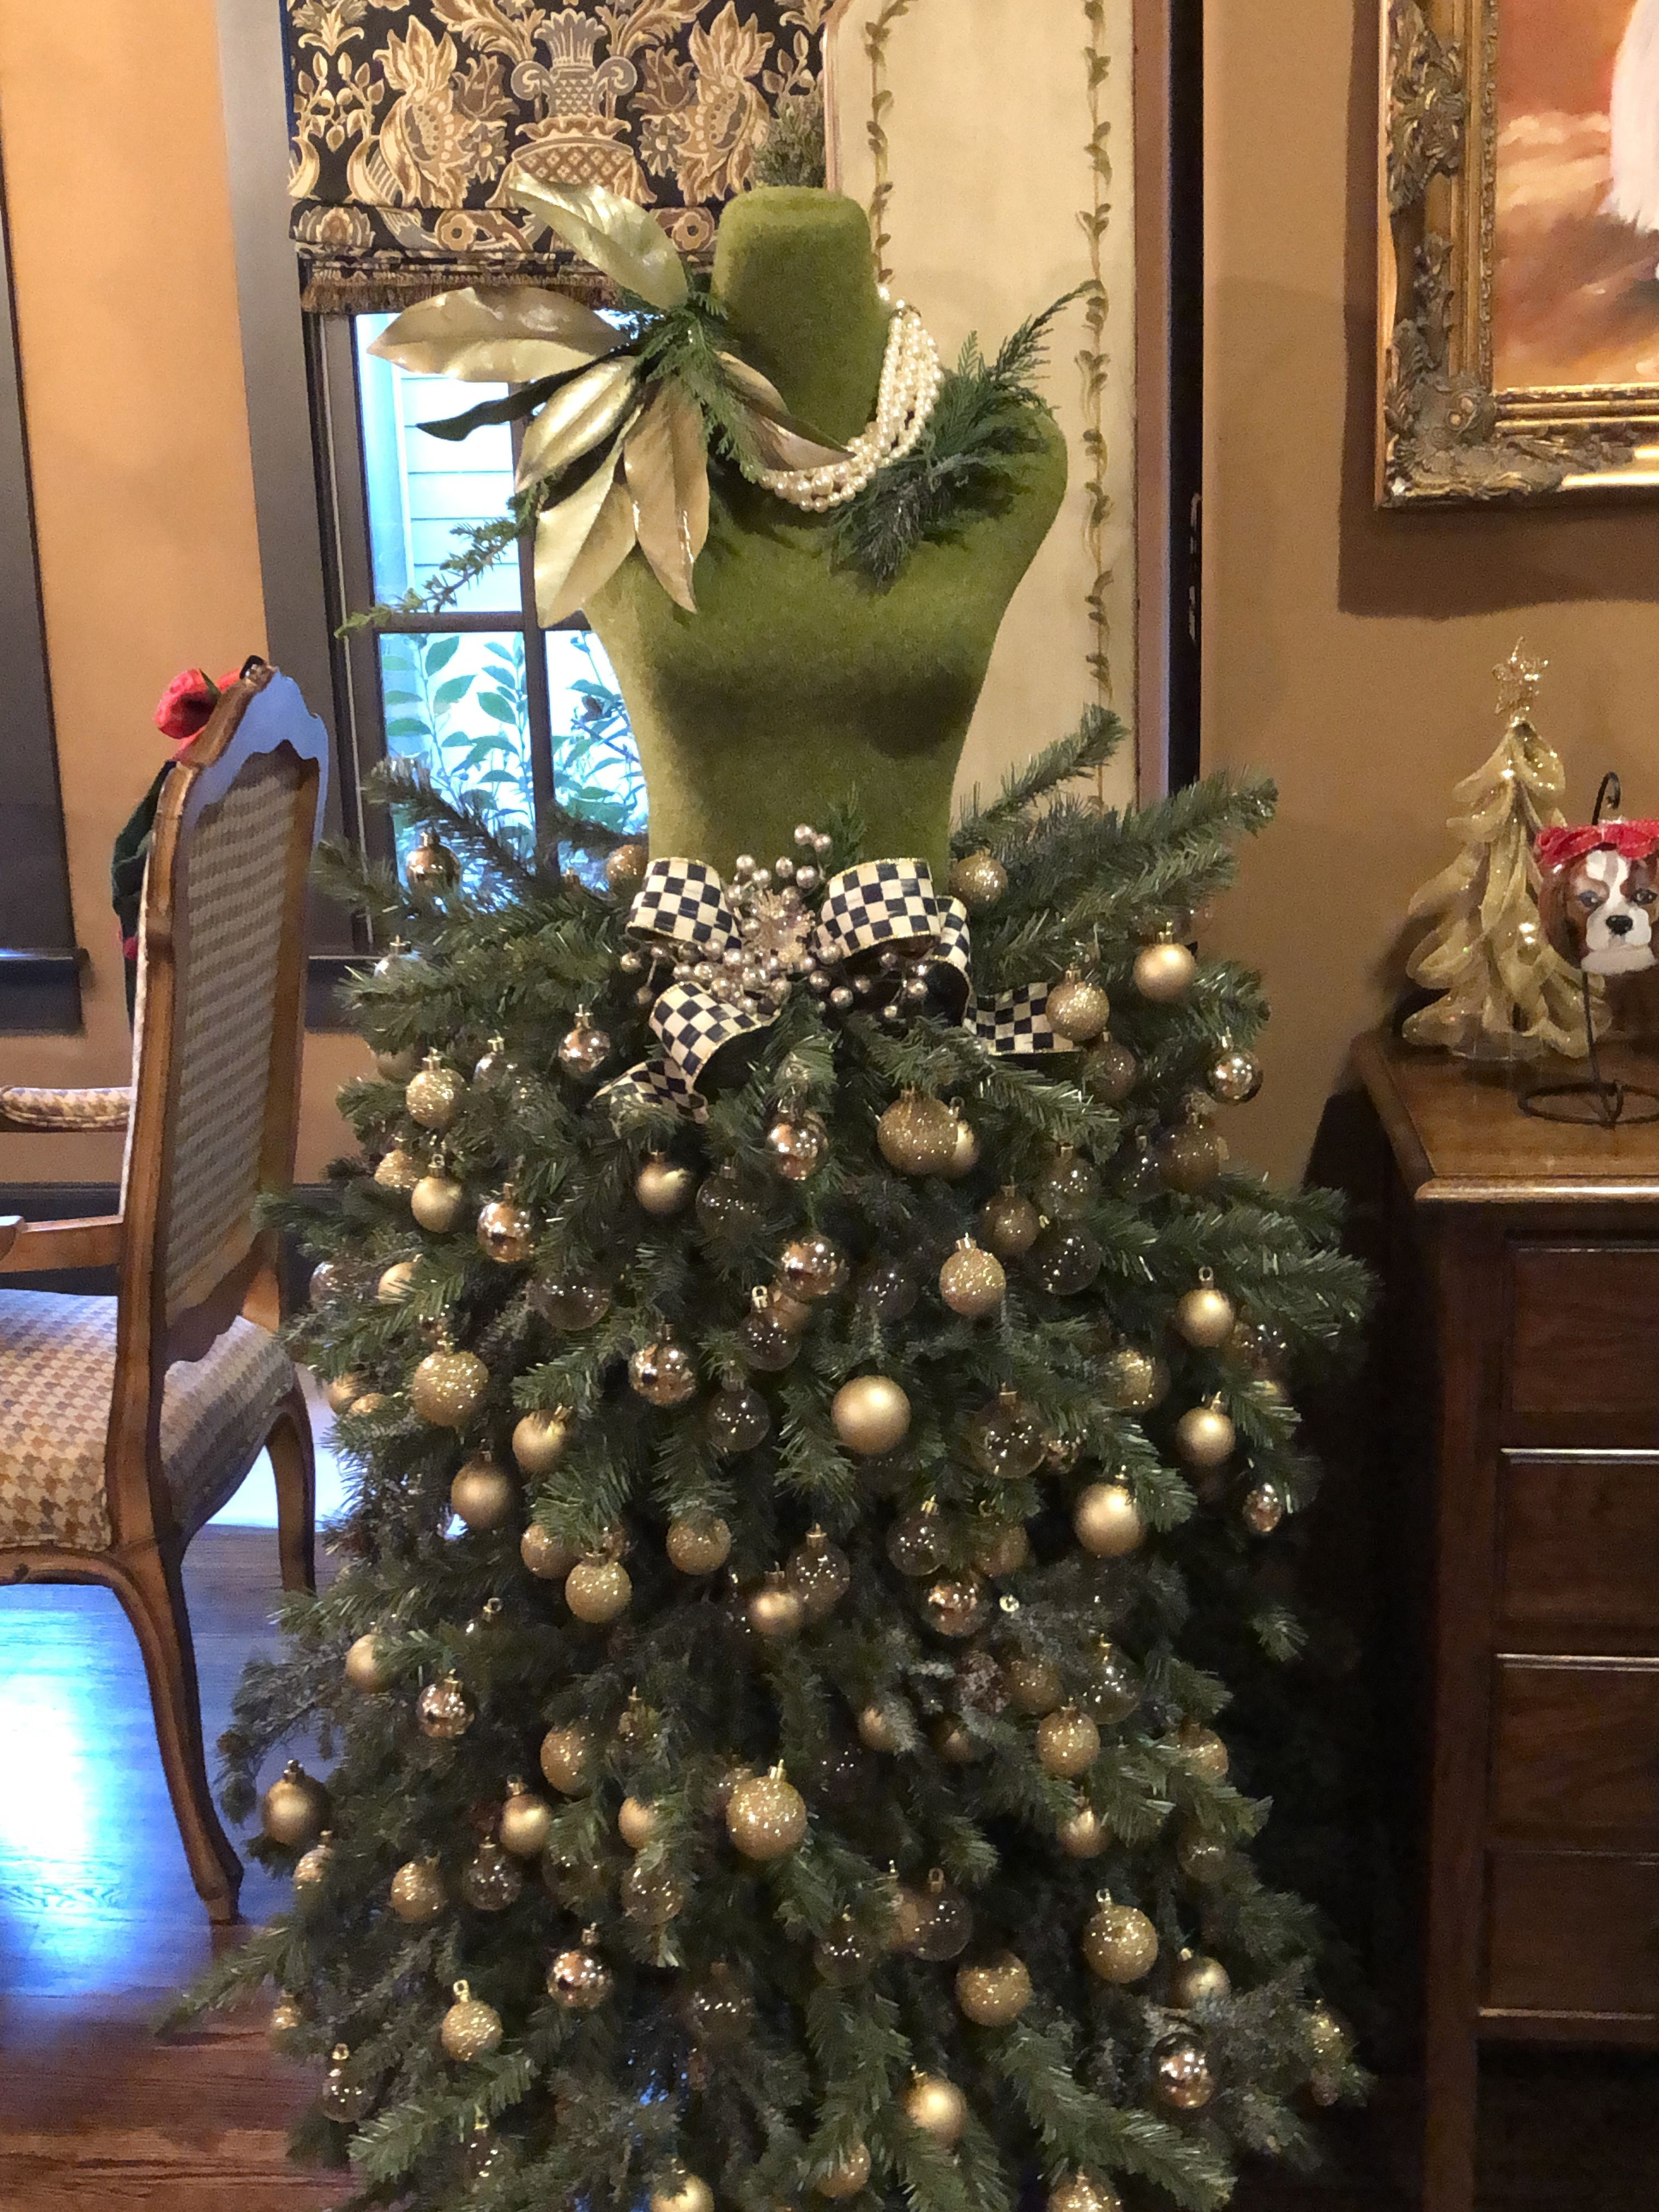 Diy Christmas Gifts Awesome Christmas Gifts Christmas Gifts Bestfriend Christmasgifts Christmas Tree Dress Chrismas Tree Decoration Mannequin Christmas Tree